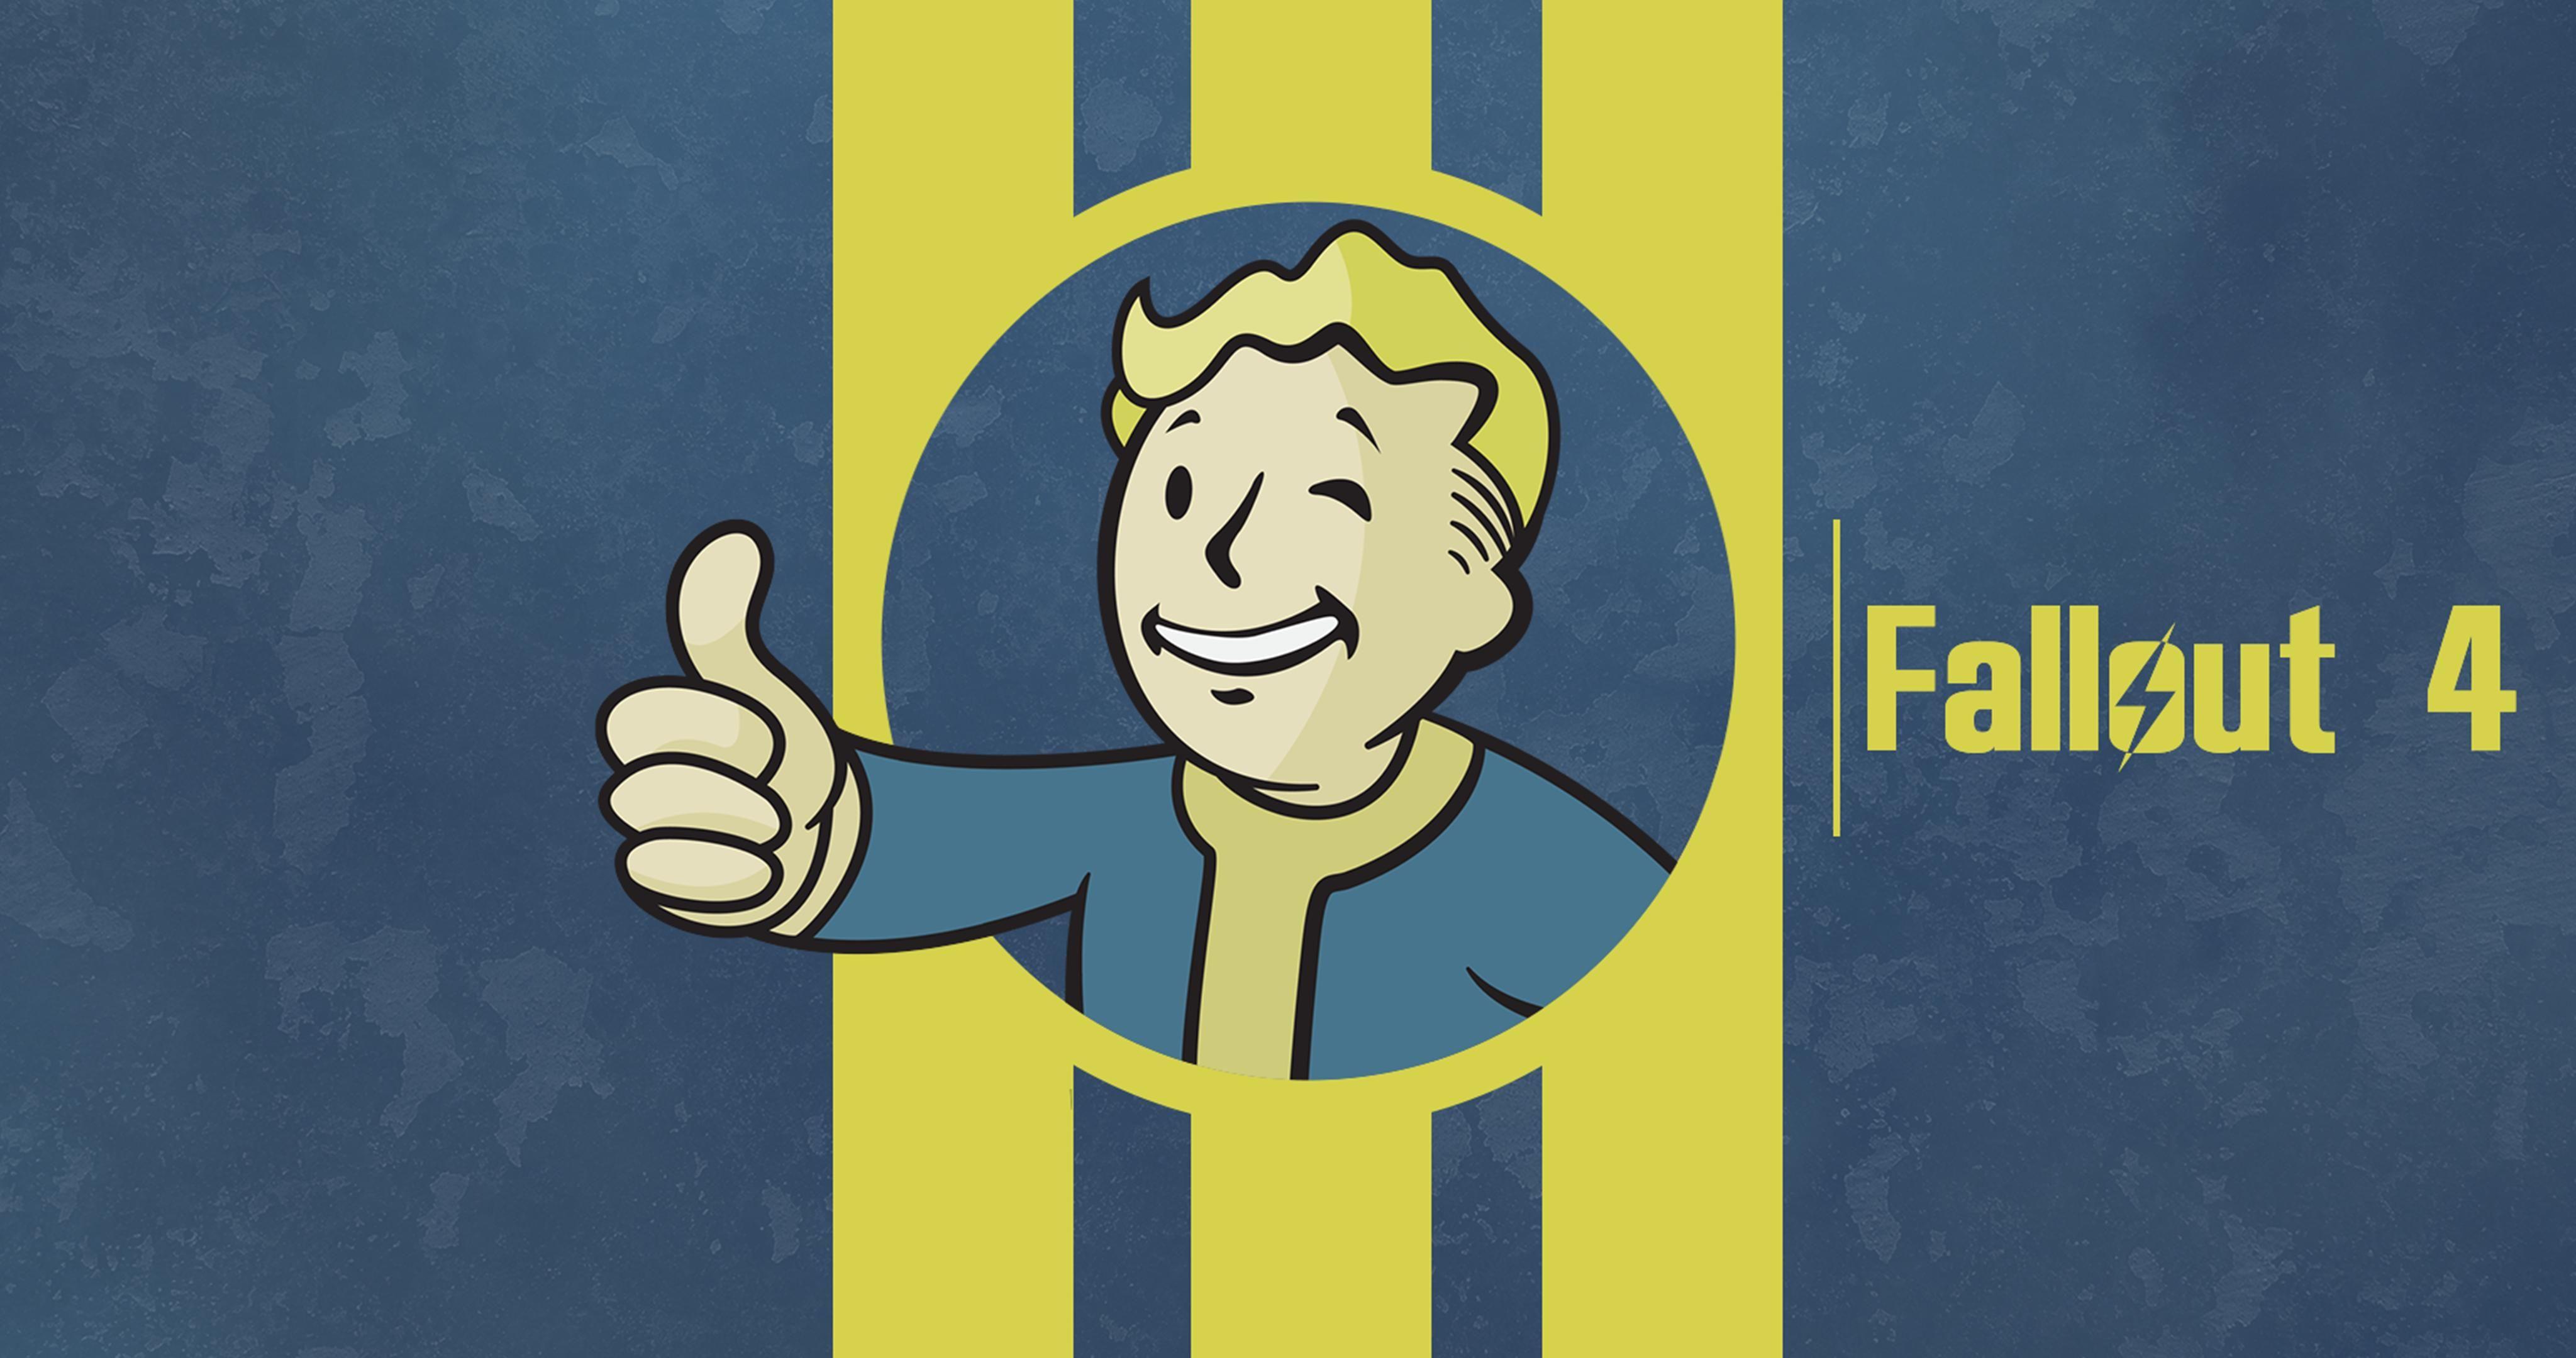 Fallout 4 Vault Boy Wallpaper Prints Boys Wallpaper Fallout Wallpaper Vault Boy